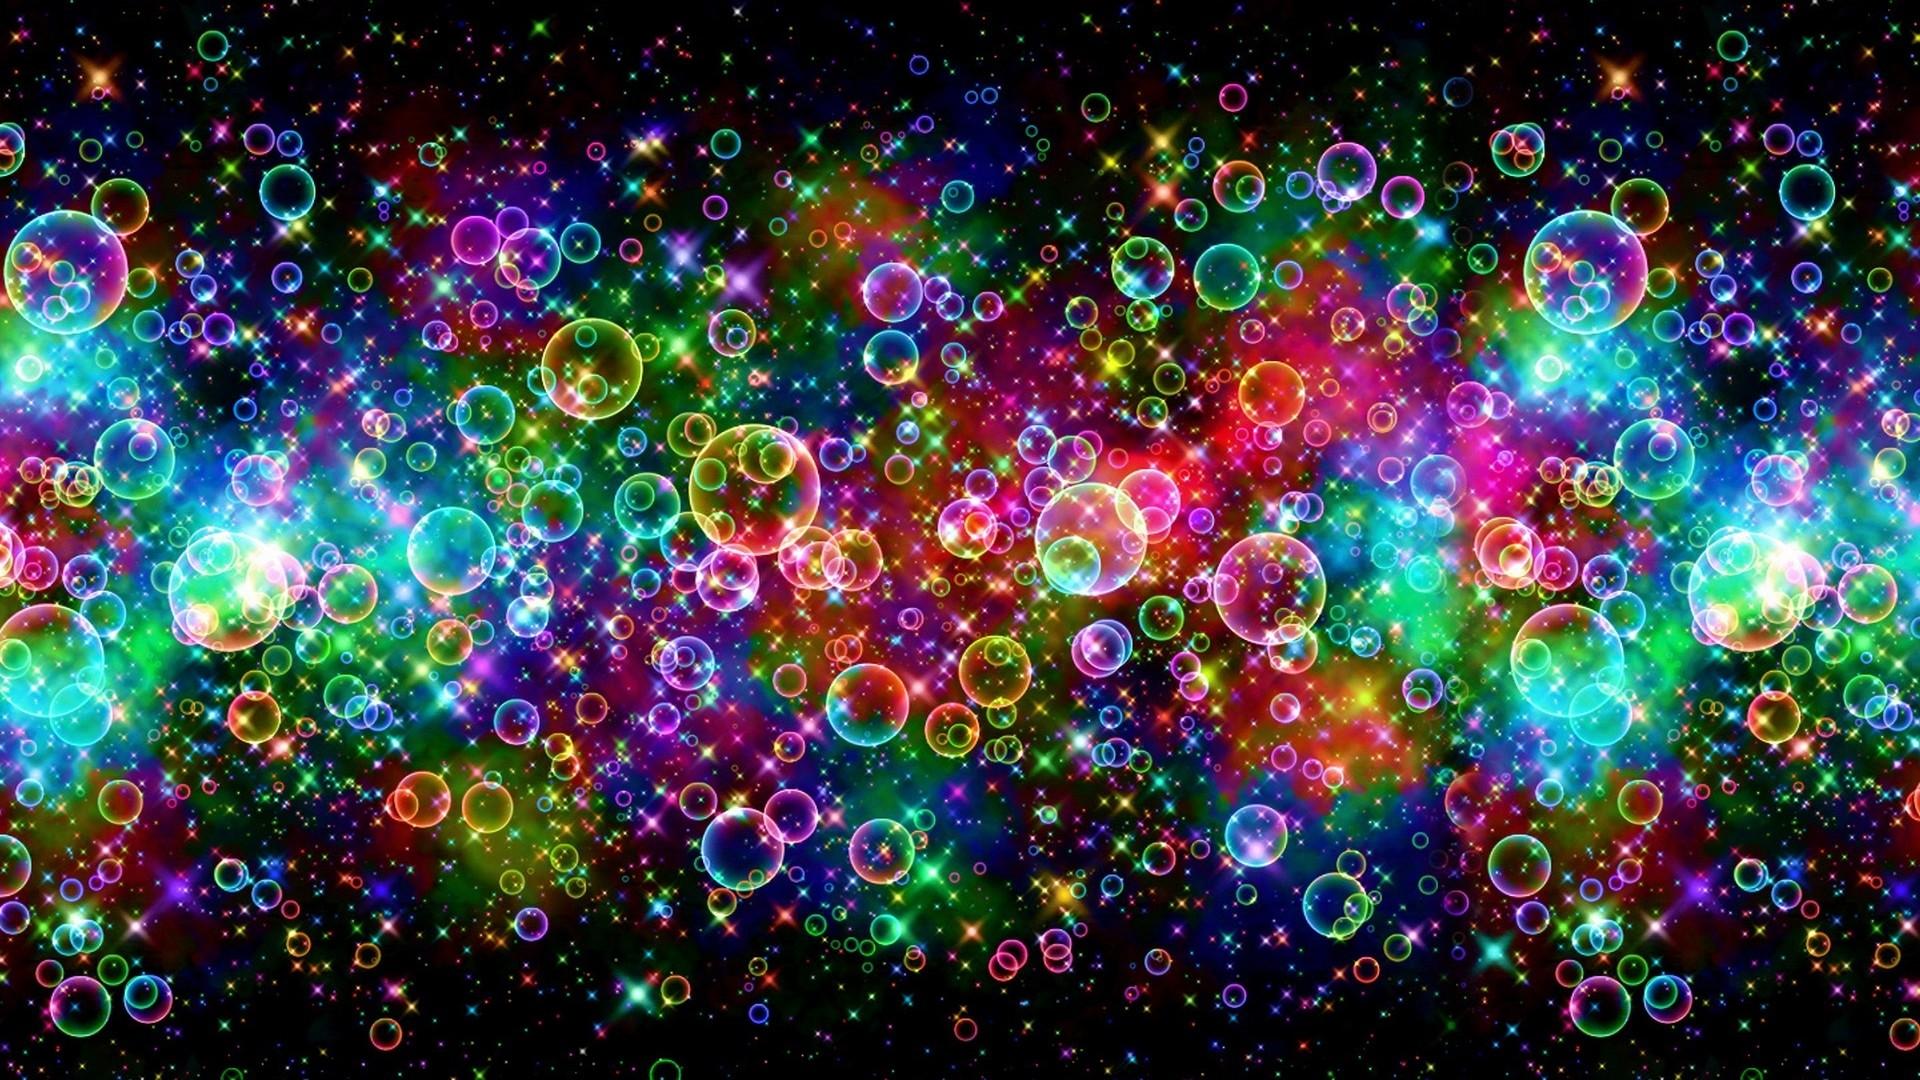 20 Beautiful Colorful Desktop Wallpaper HD Collections